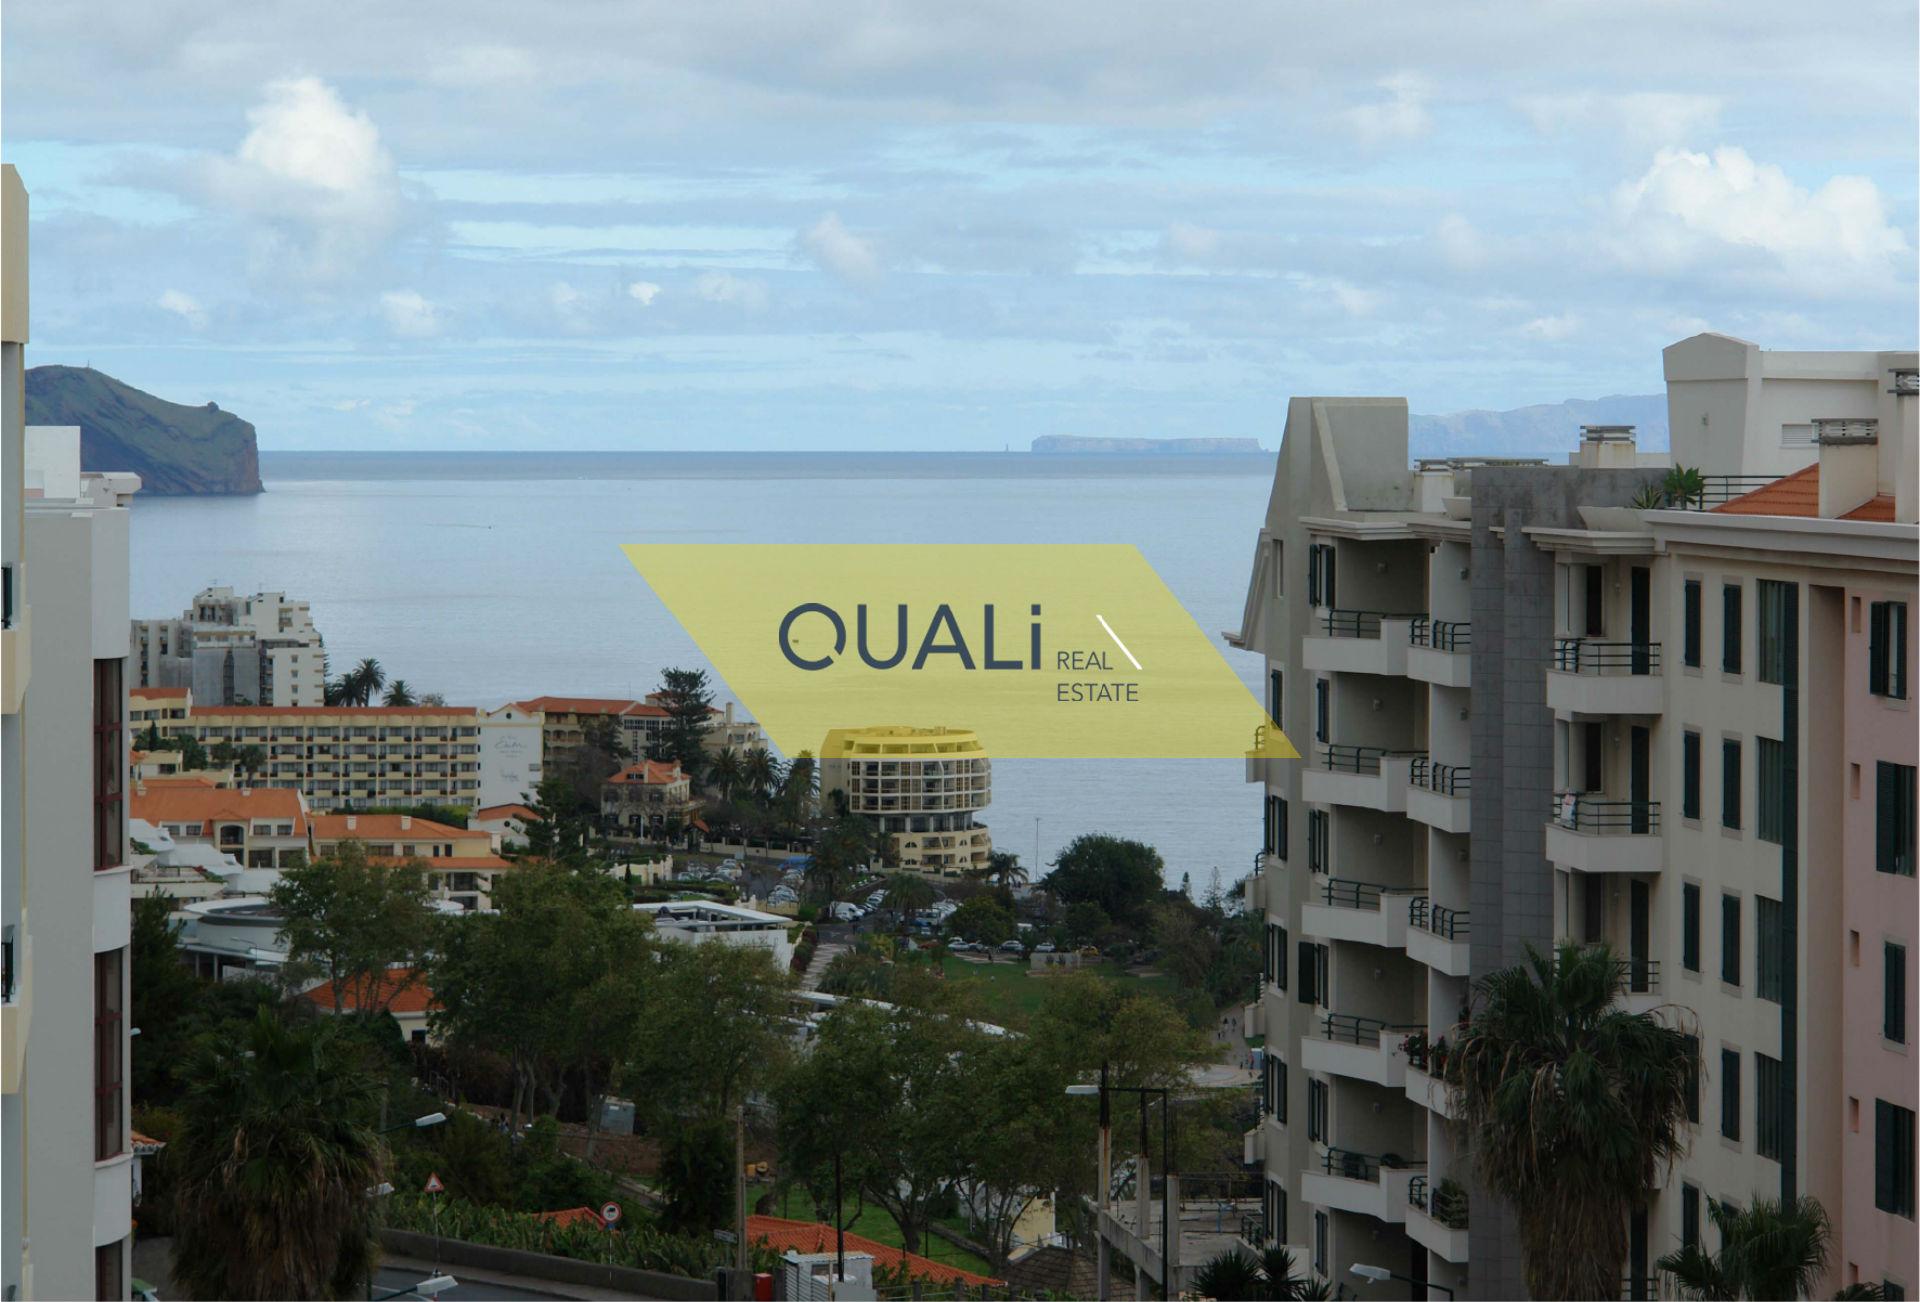 Hotel no Funchal Ilha da Madeira à Venda. €1.500.000,00